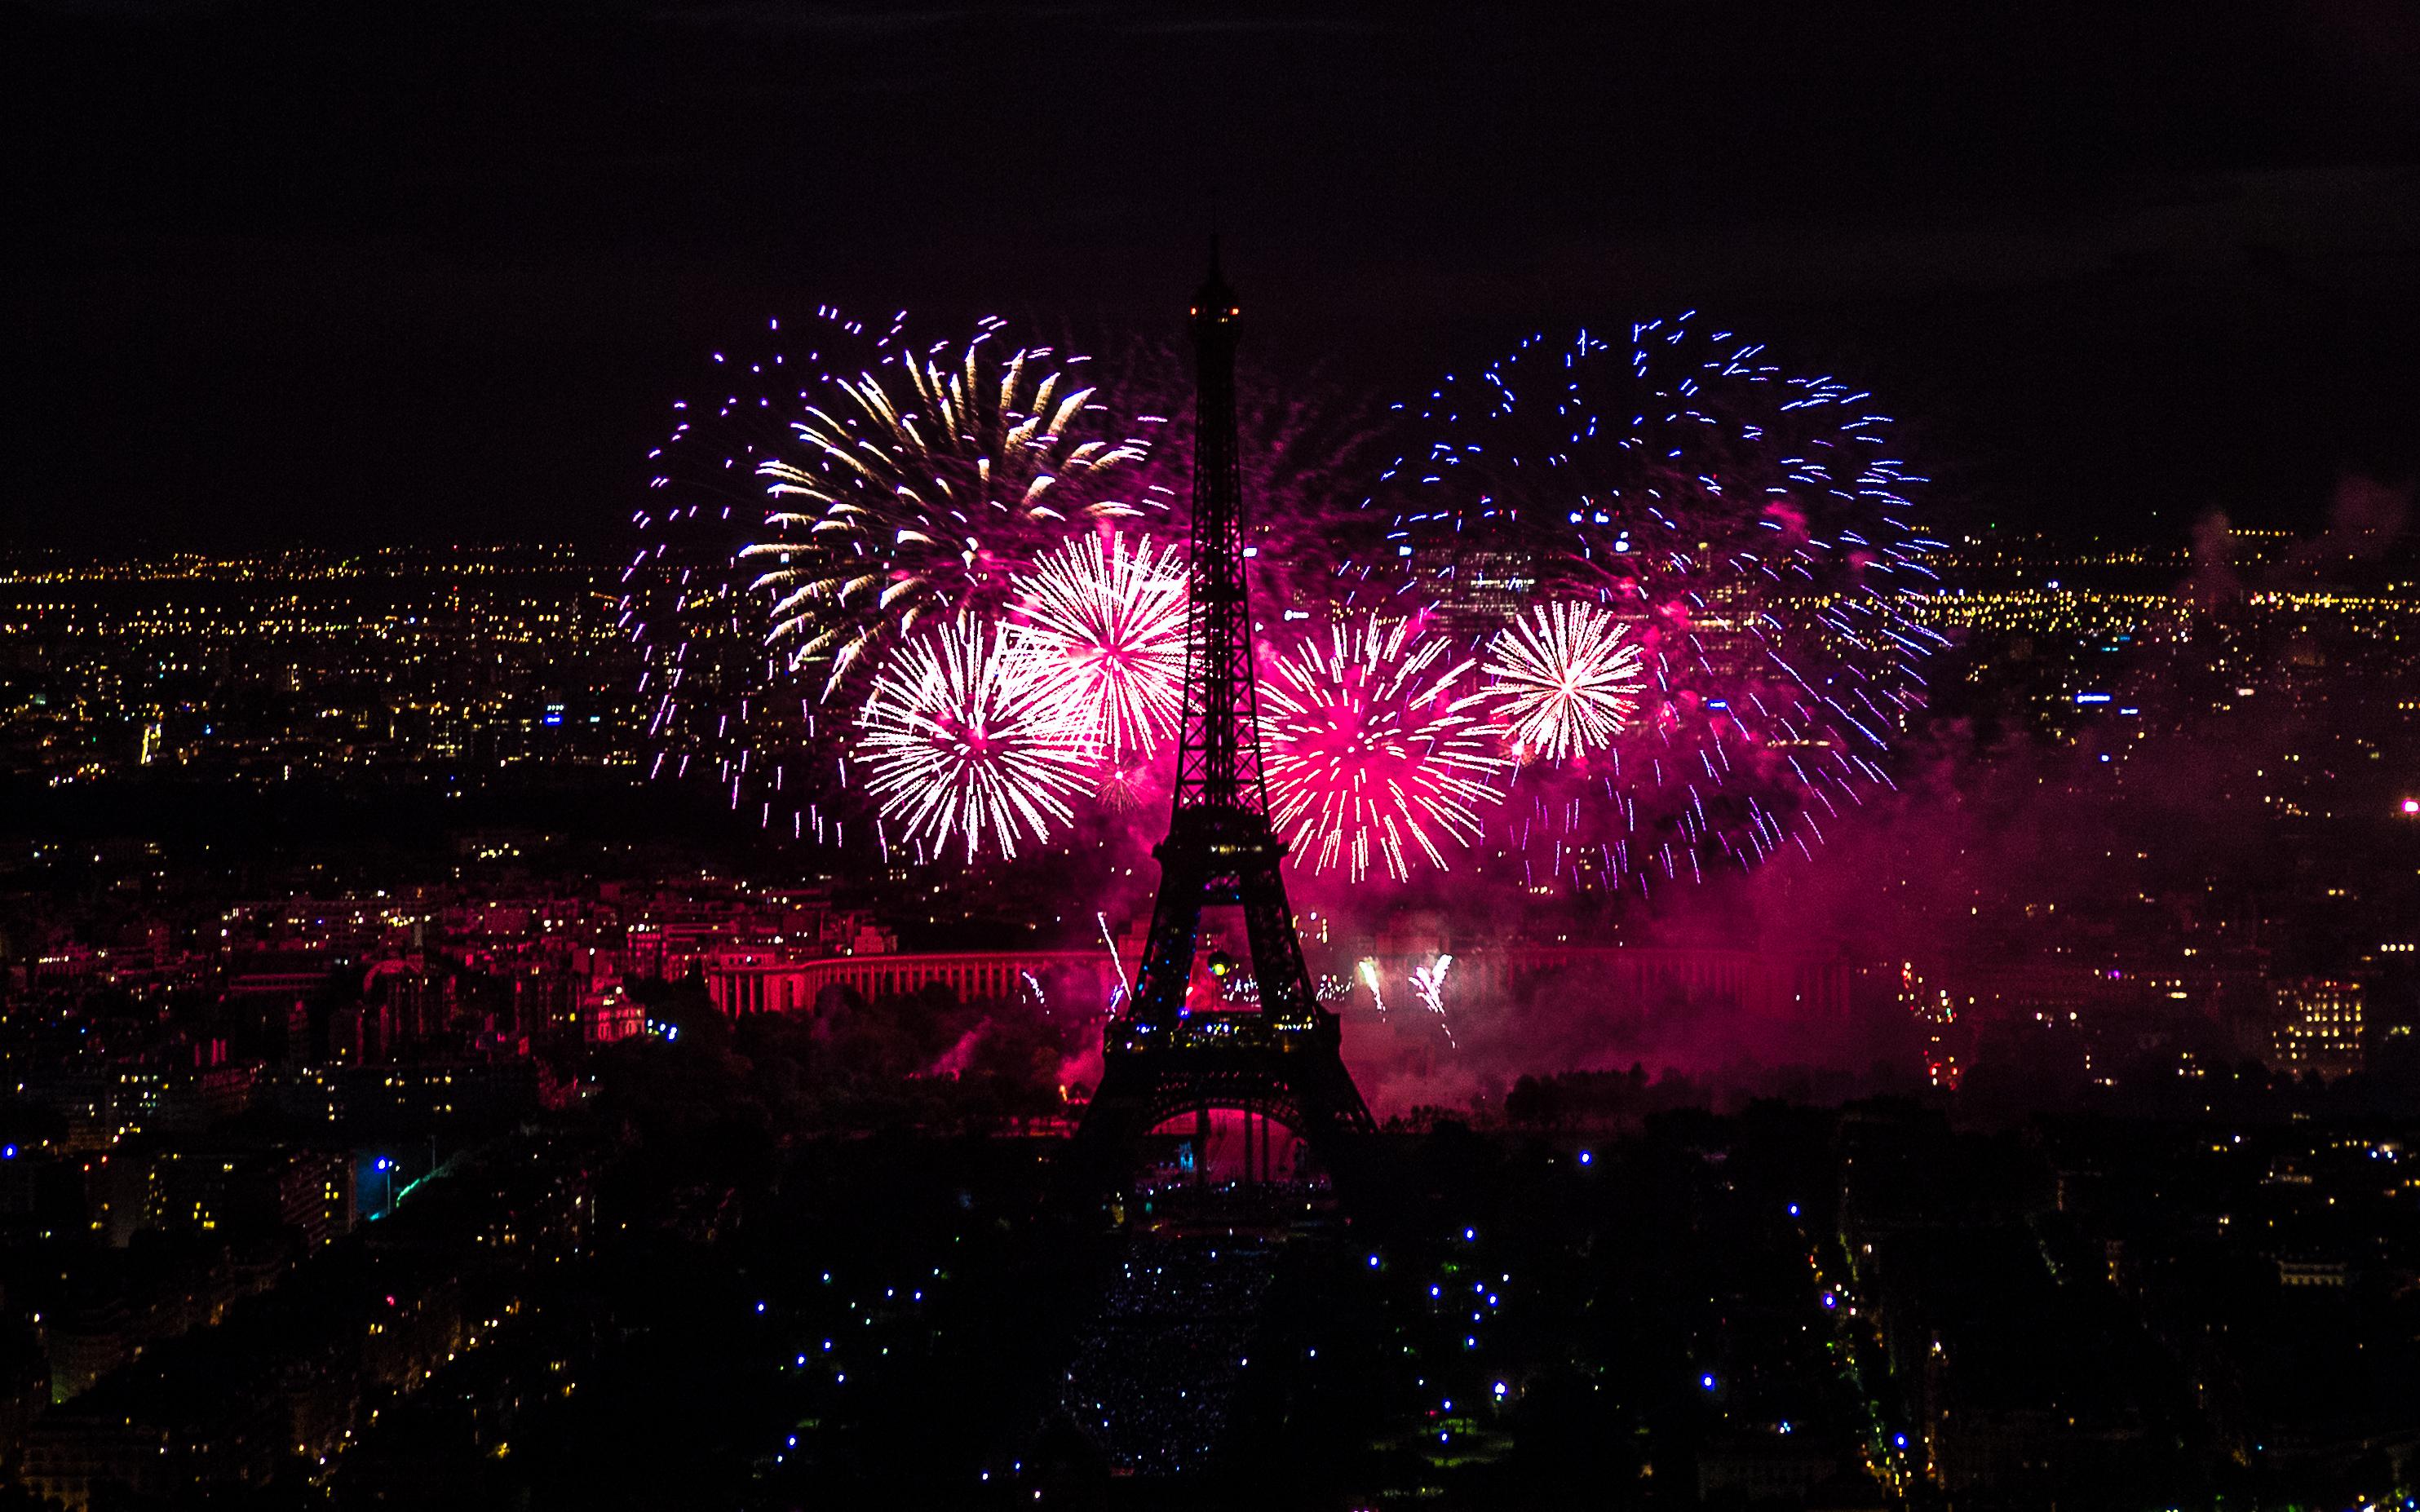 file:2012 fireworks on eiffel tower 13 - wikimedia commons